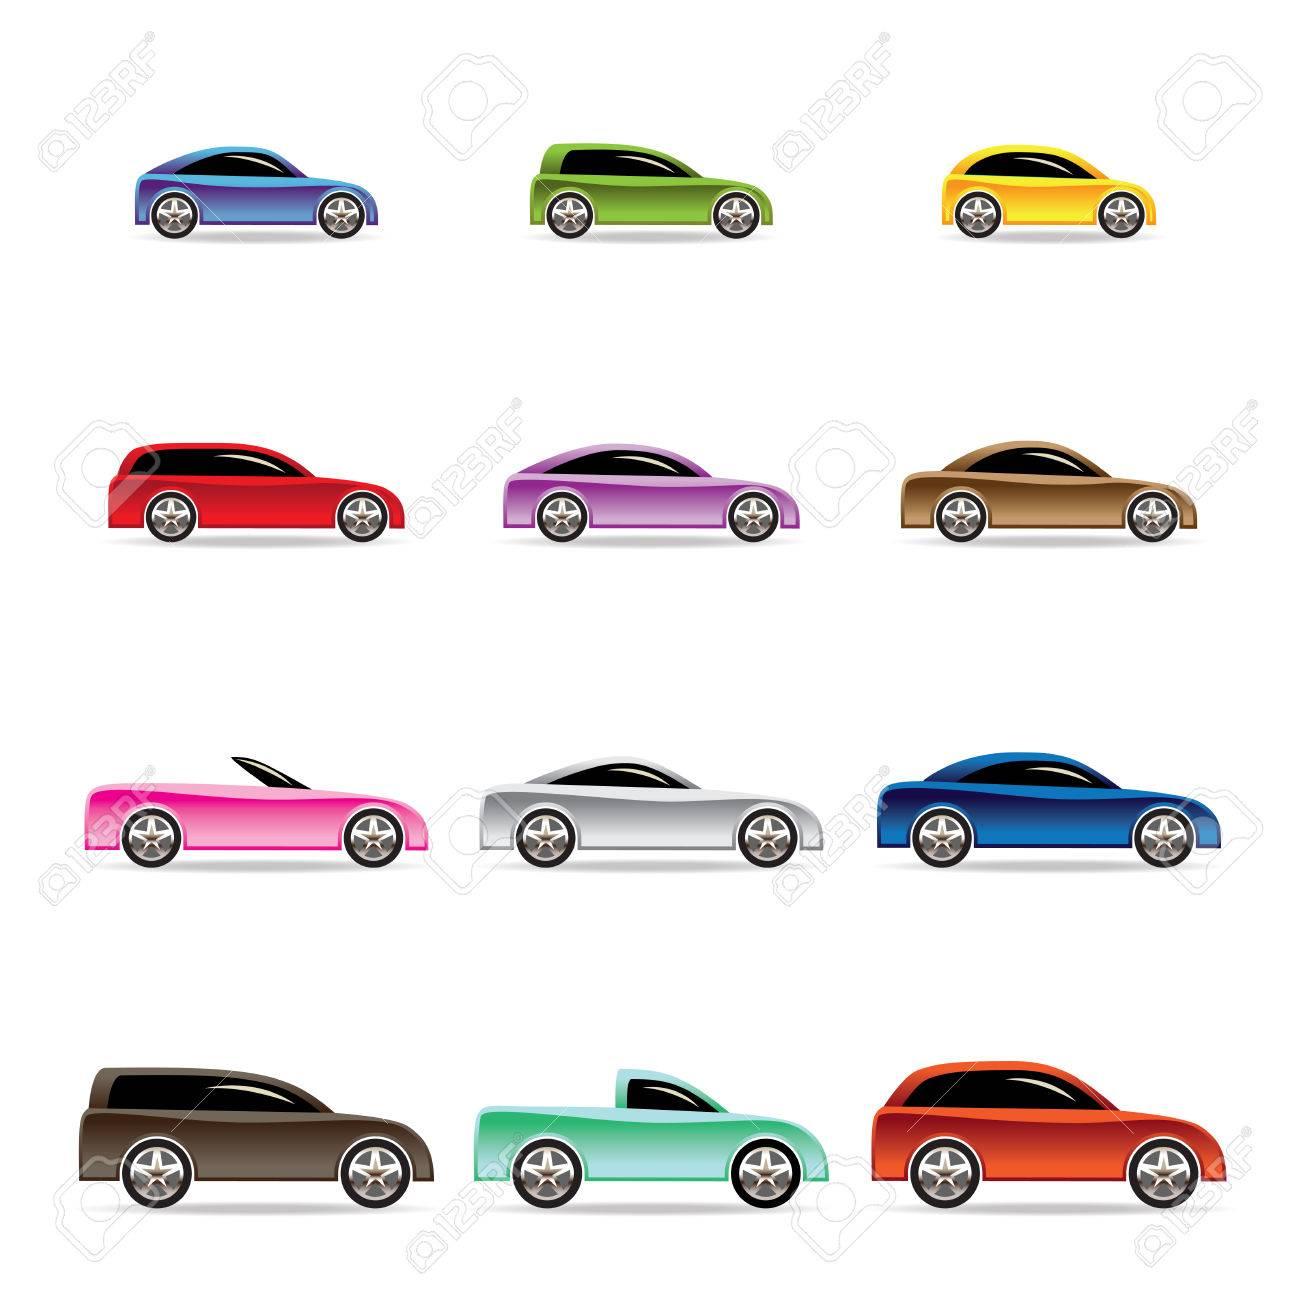 Different Types Of Cars >> Different Types Of Cars Icons Vector Icon Set